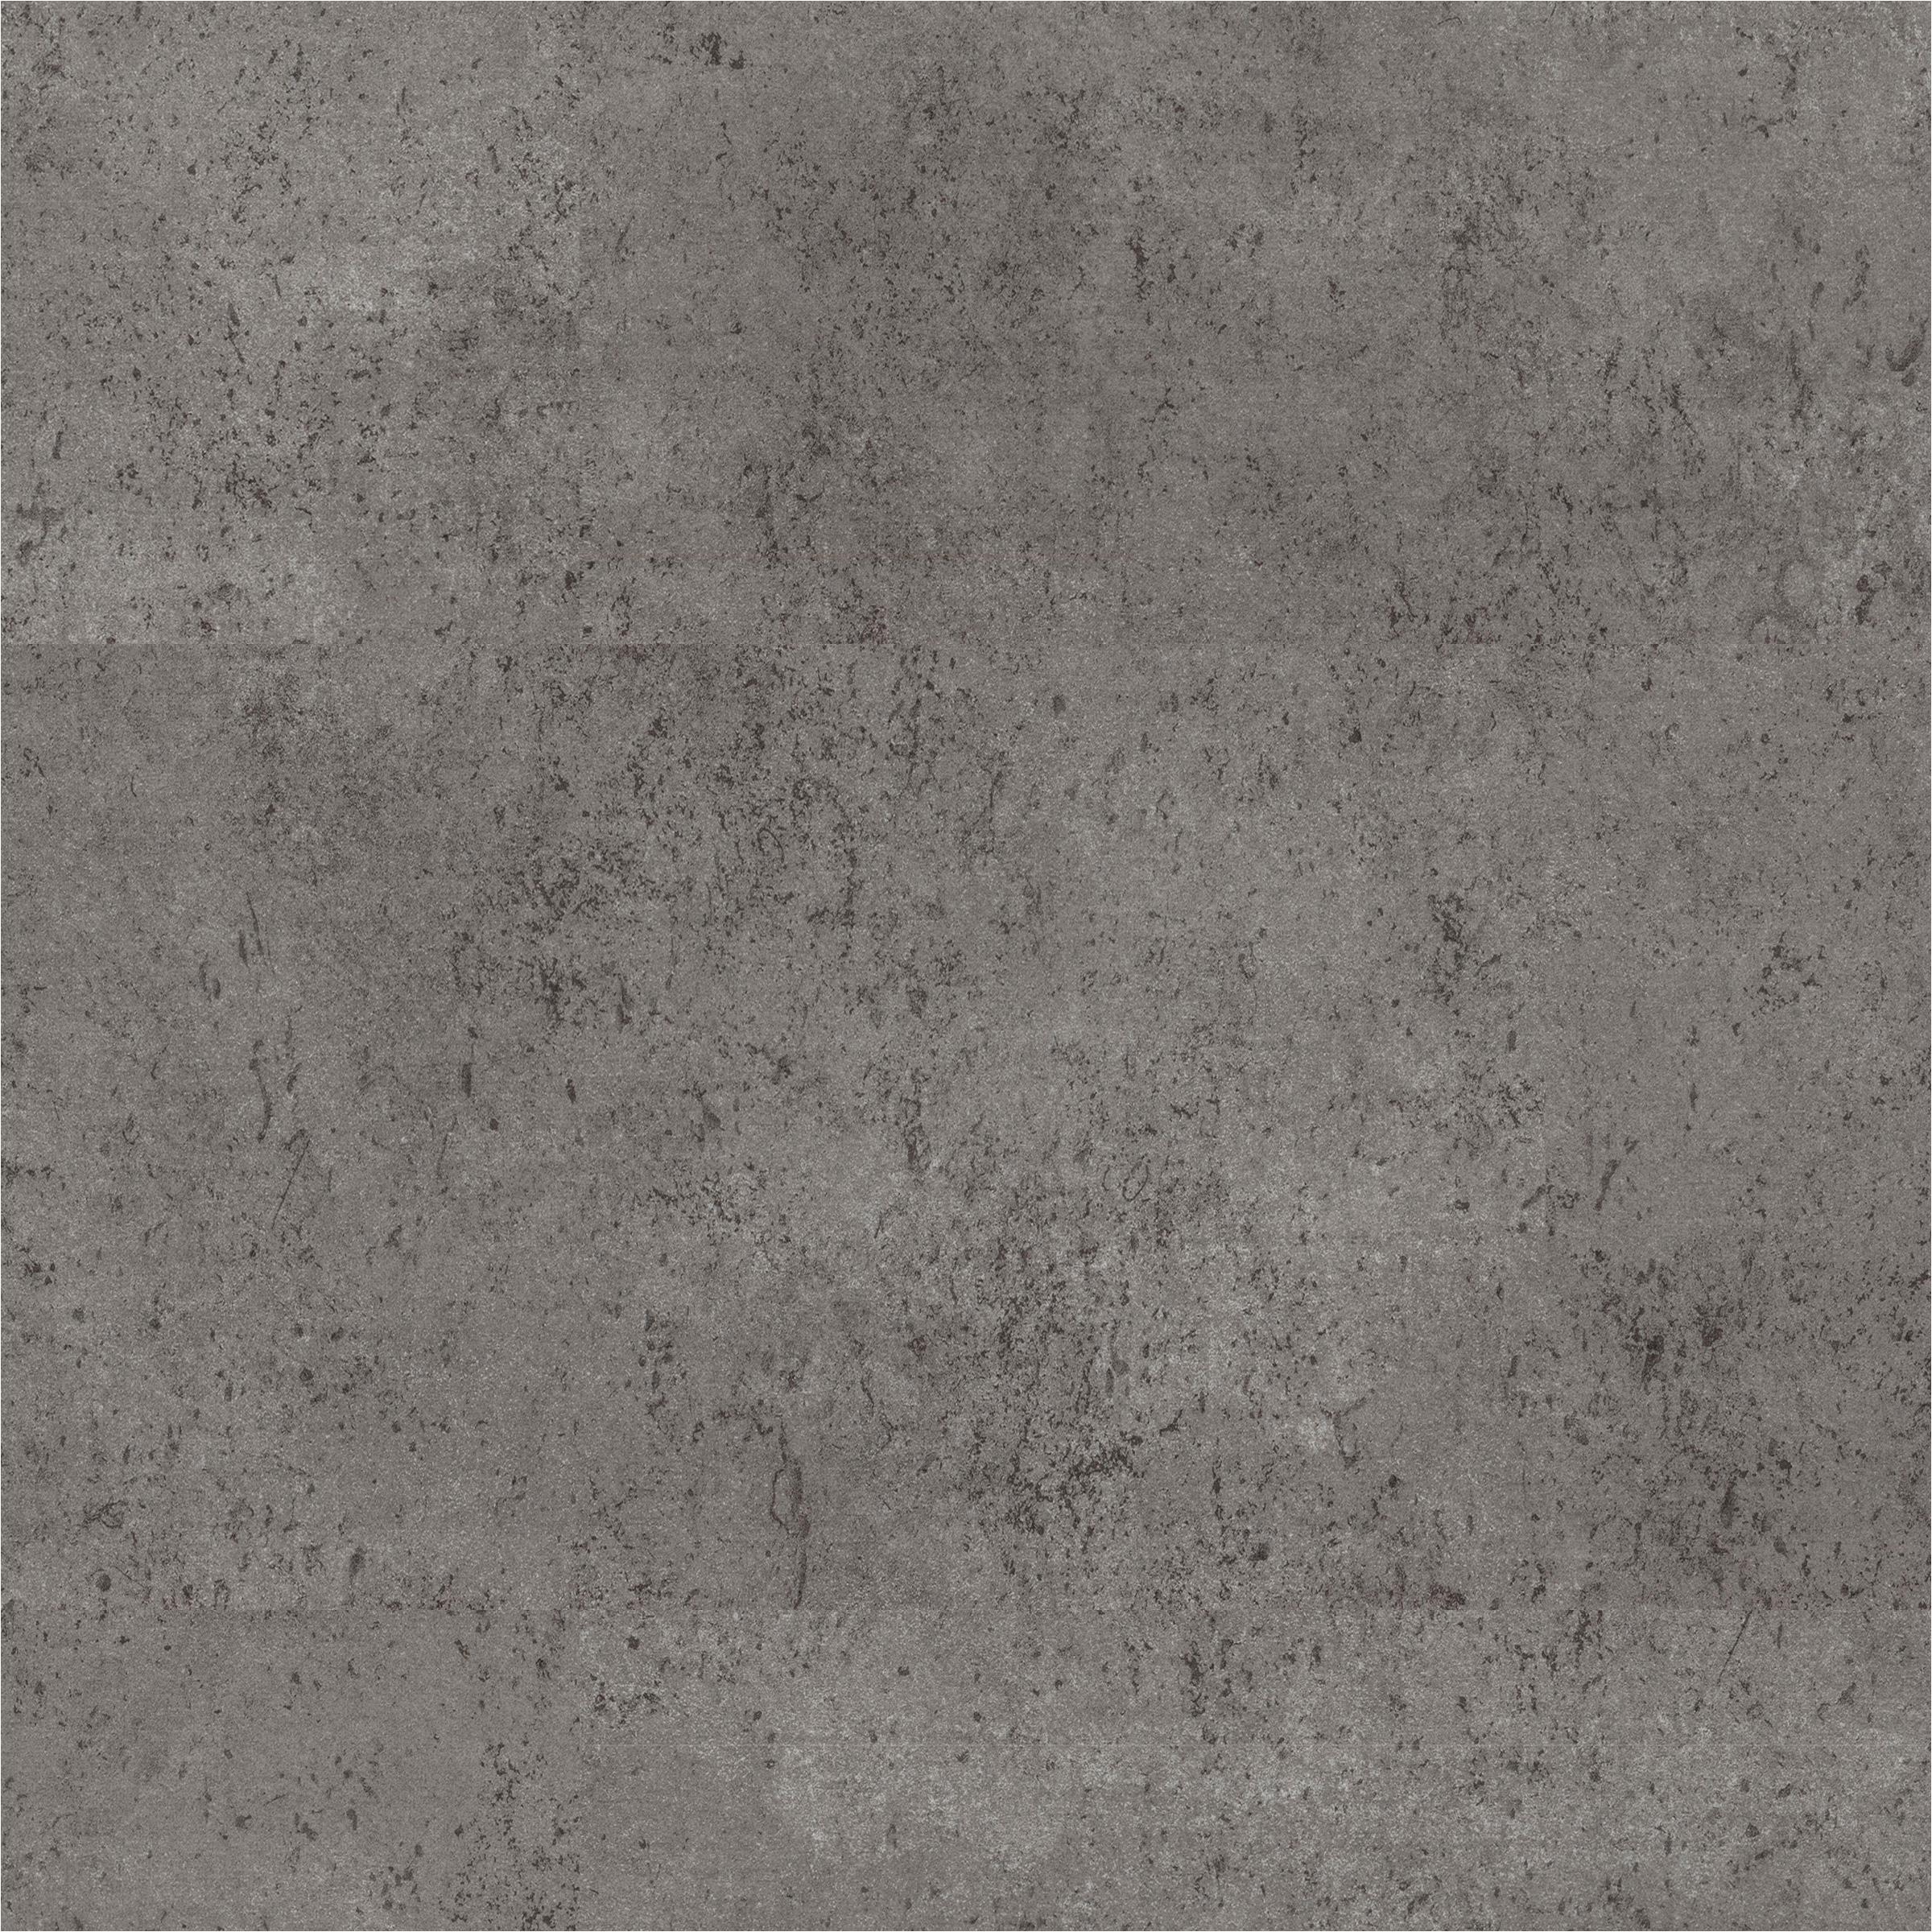 ivc moduleo vision oasis stone grey 12 x 24 glue down luxury vinyl tile flooring 60325